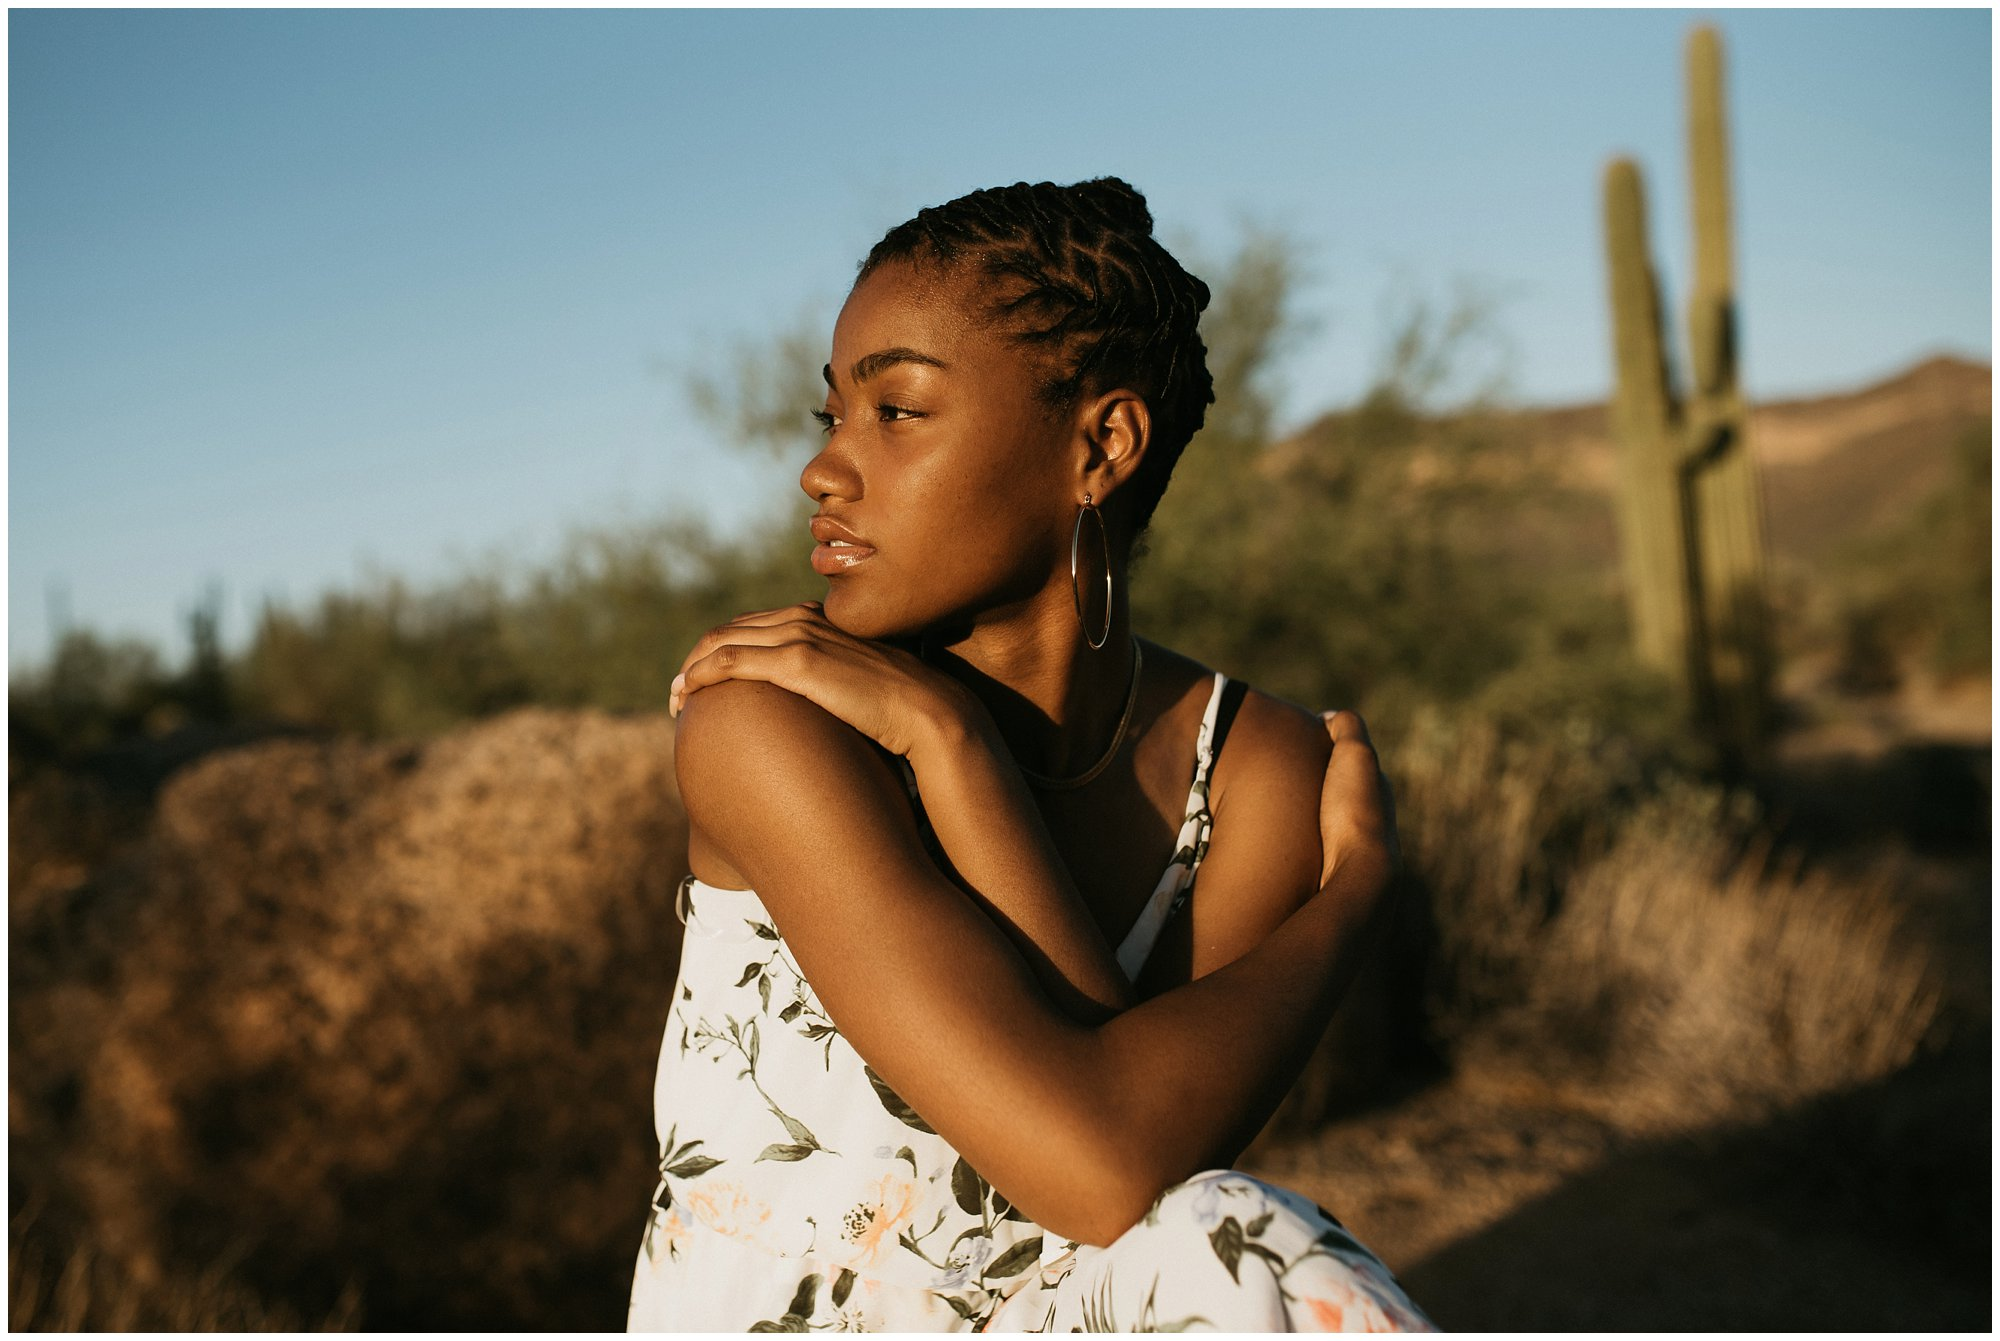 Desert Model Portrait Session - Ashtyn Nicole Photo_0018.jpg